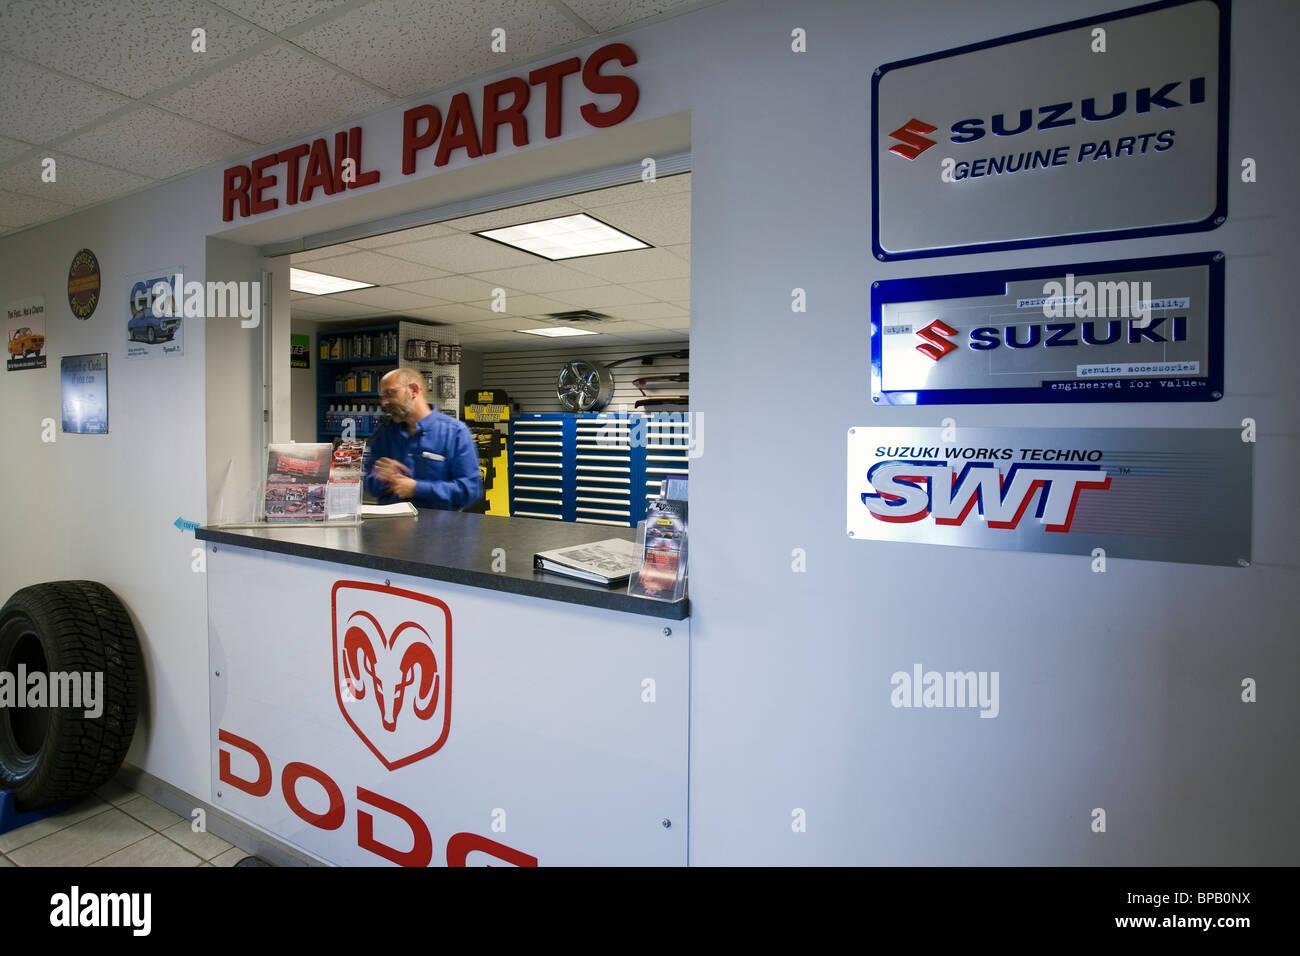 parts specials ram jeep dealer htm fox dealership service new contact chrysler dodge